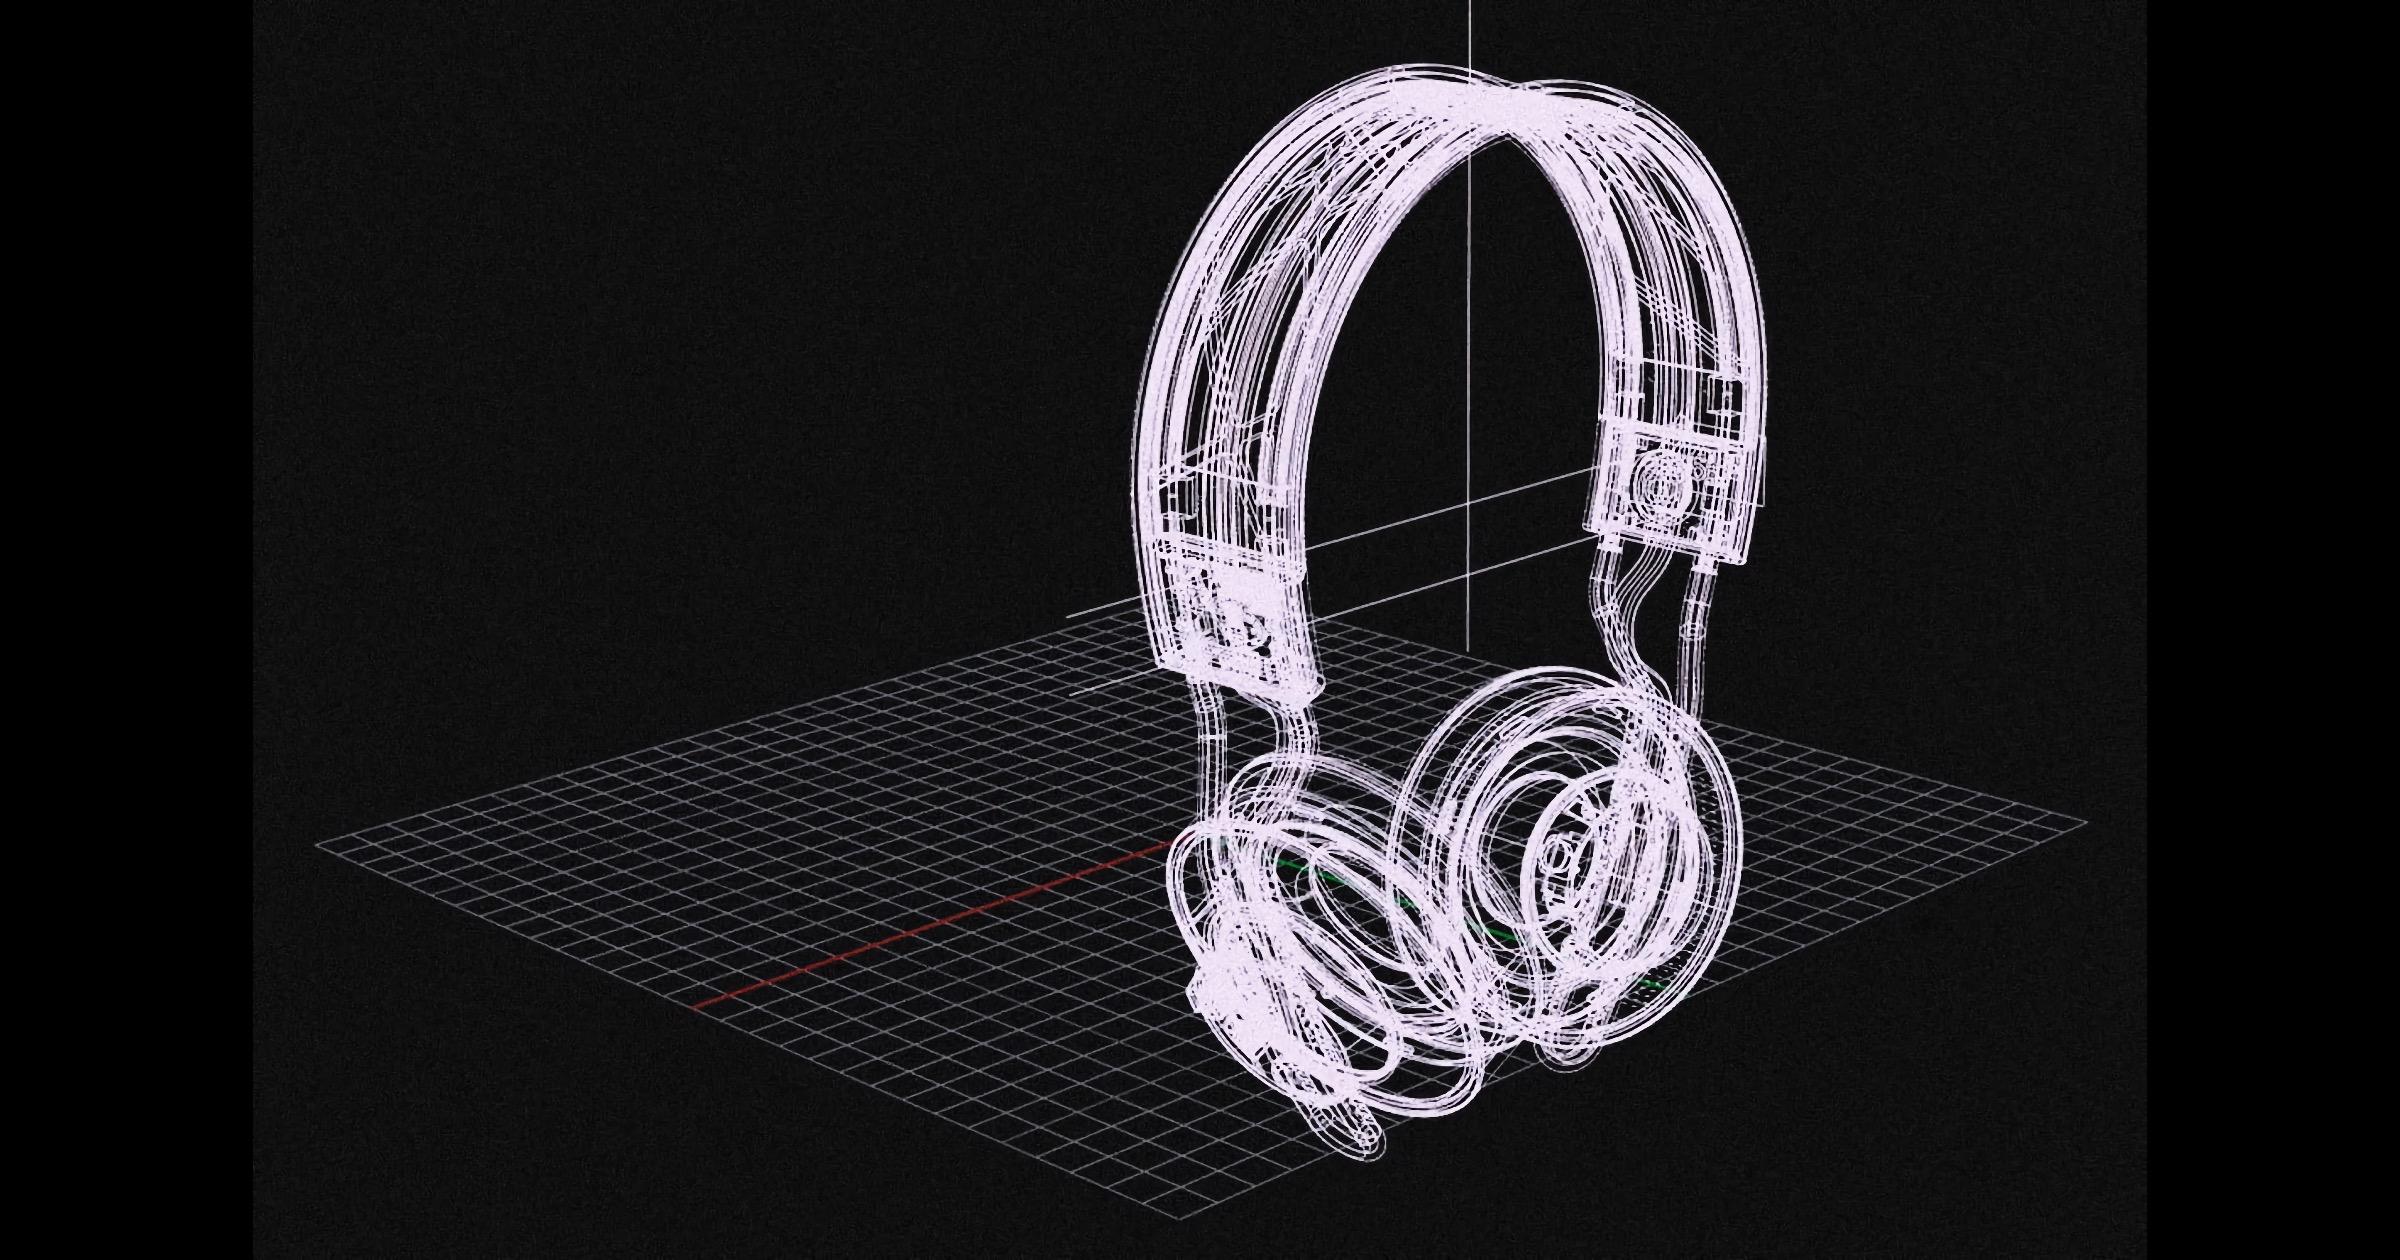 Adidas solar powered headphones concept image